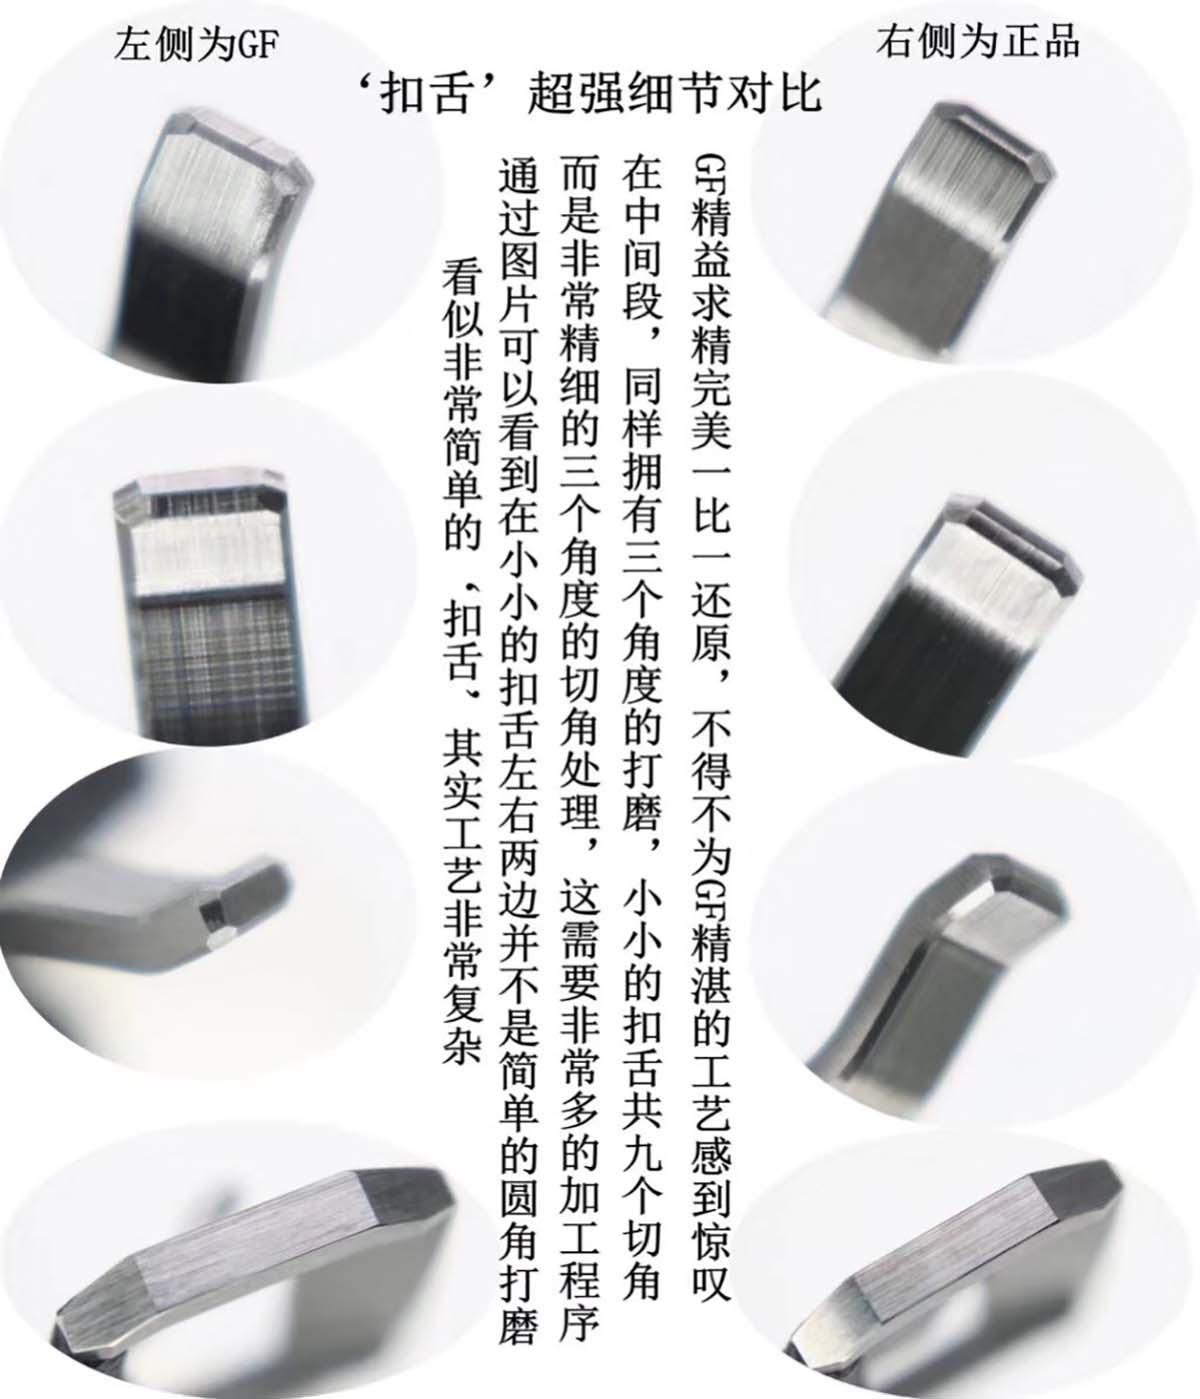 GF厂宝珀五十寻「黑陶瓷材质」复刻腕表做工细节对比正品图文评测